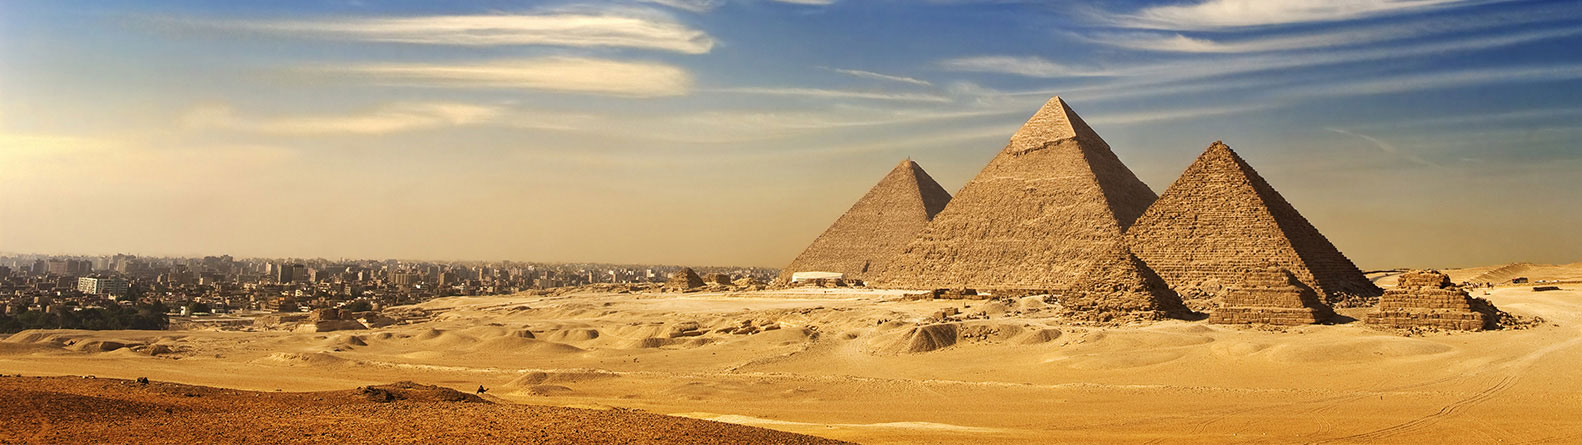 Pyramid Giza Egypt.jpg